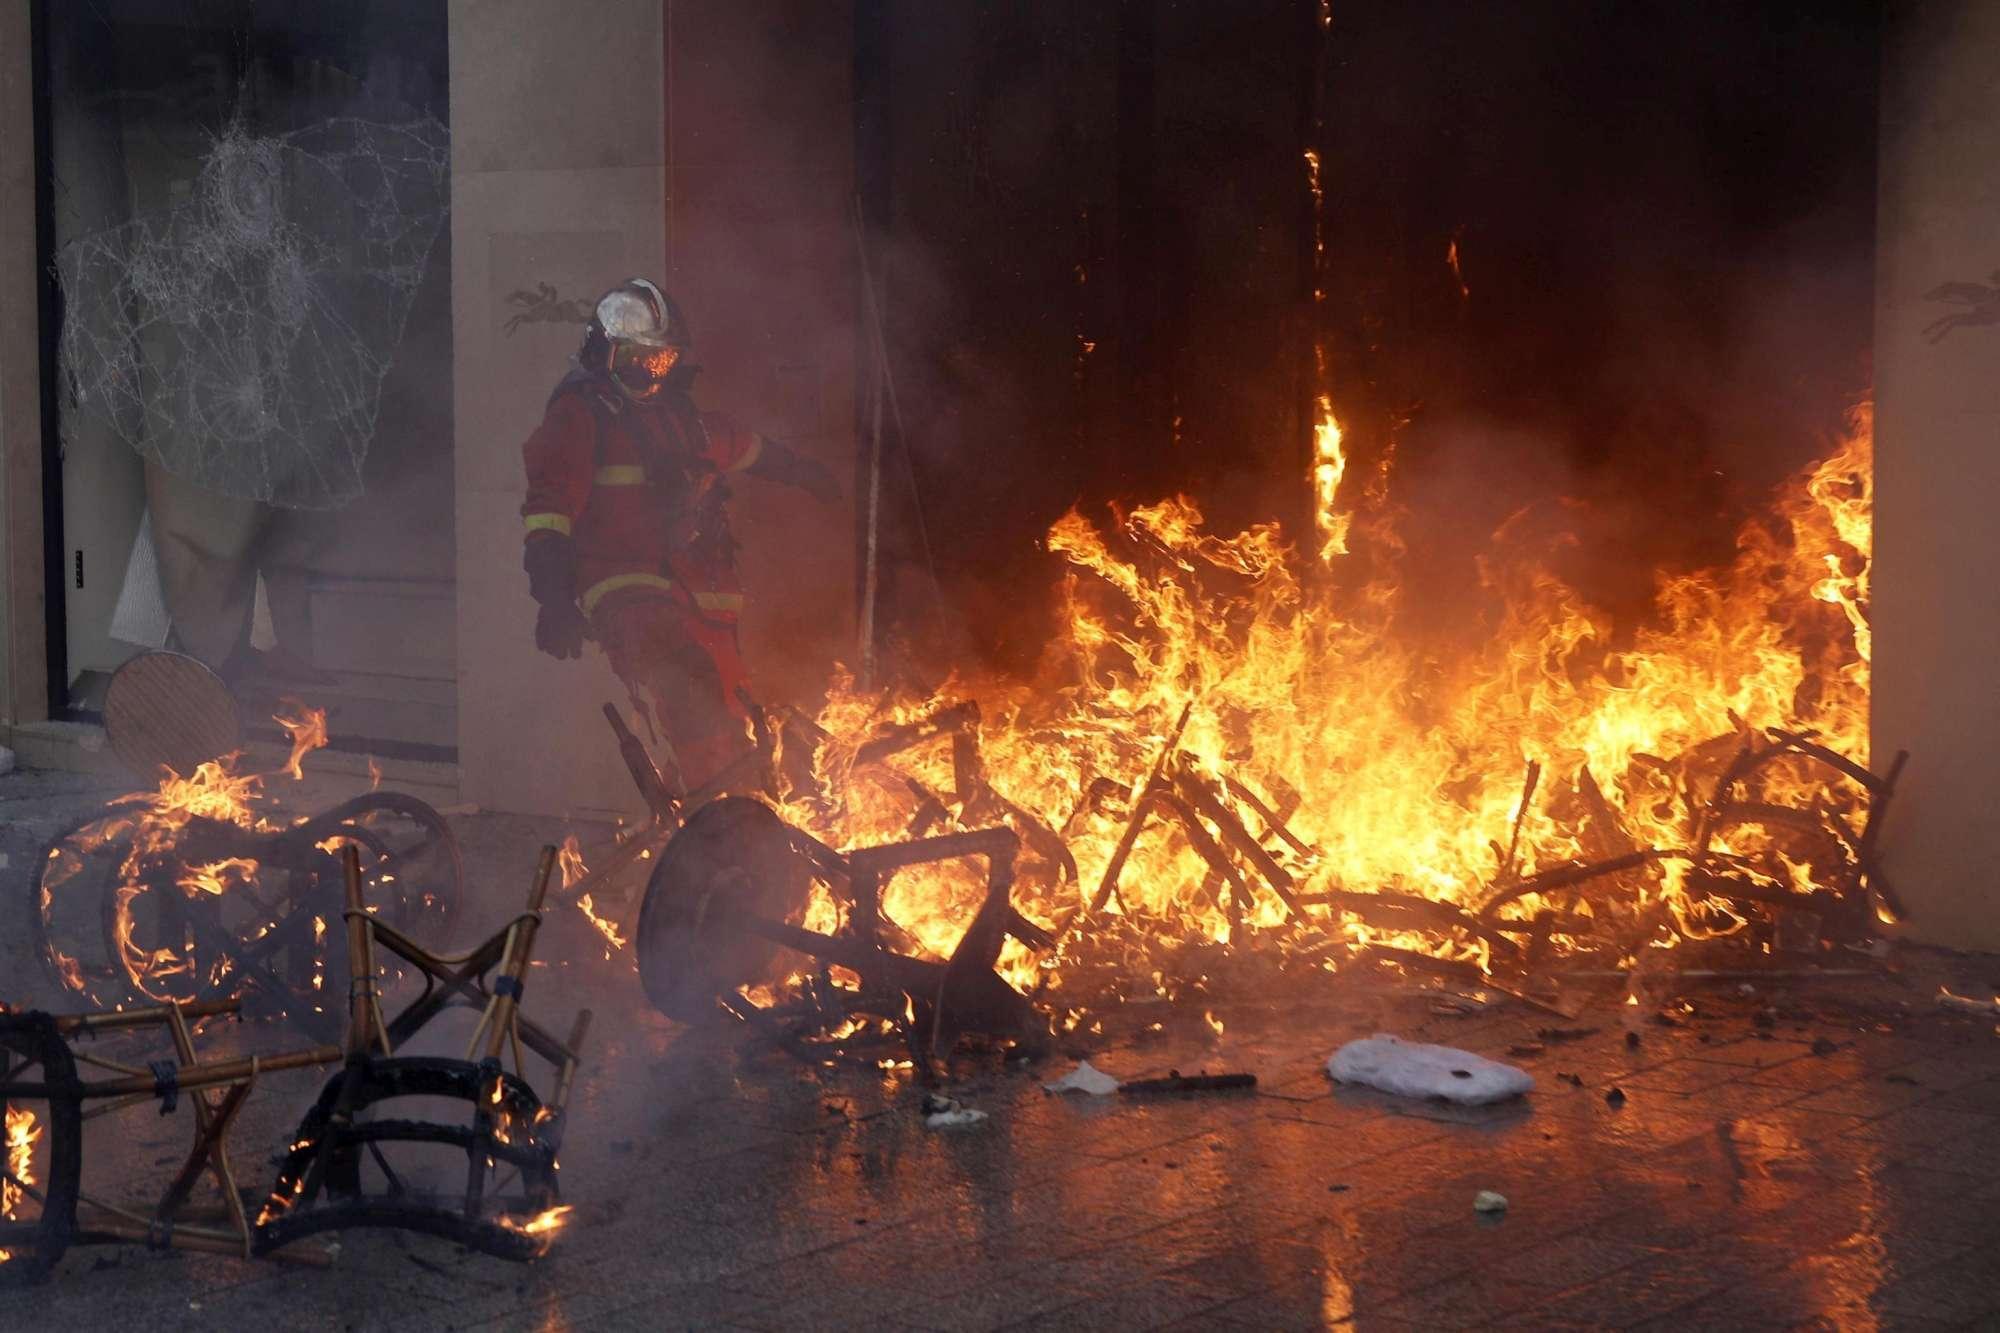 Gilet gialli, violenti scontri a Parigi e negozi saccheggiati